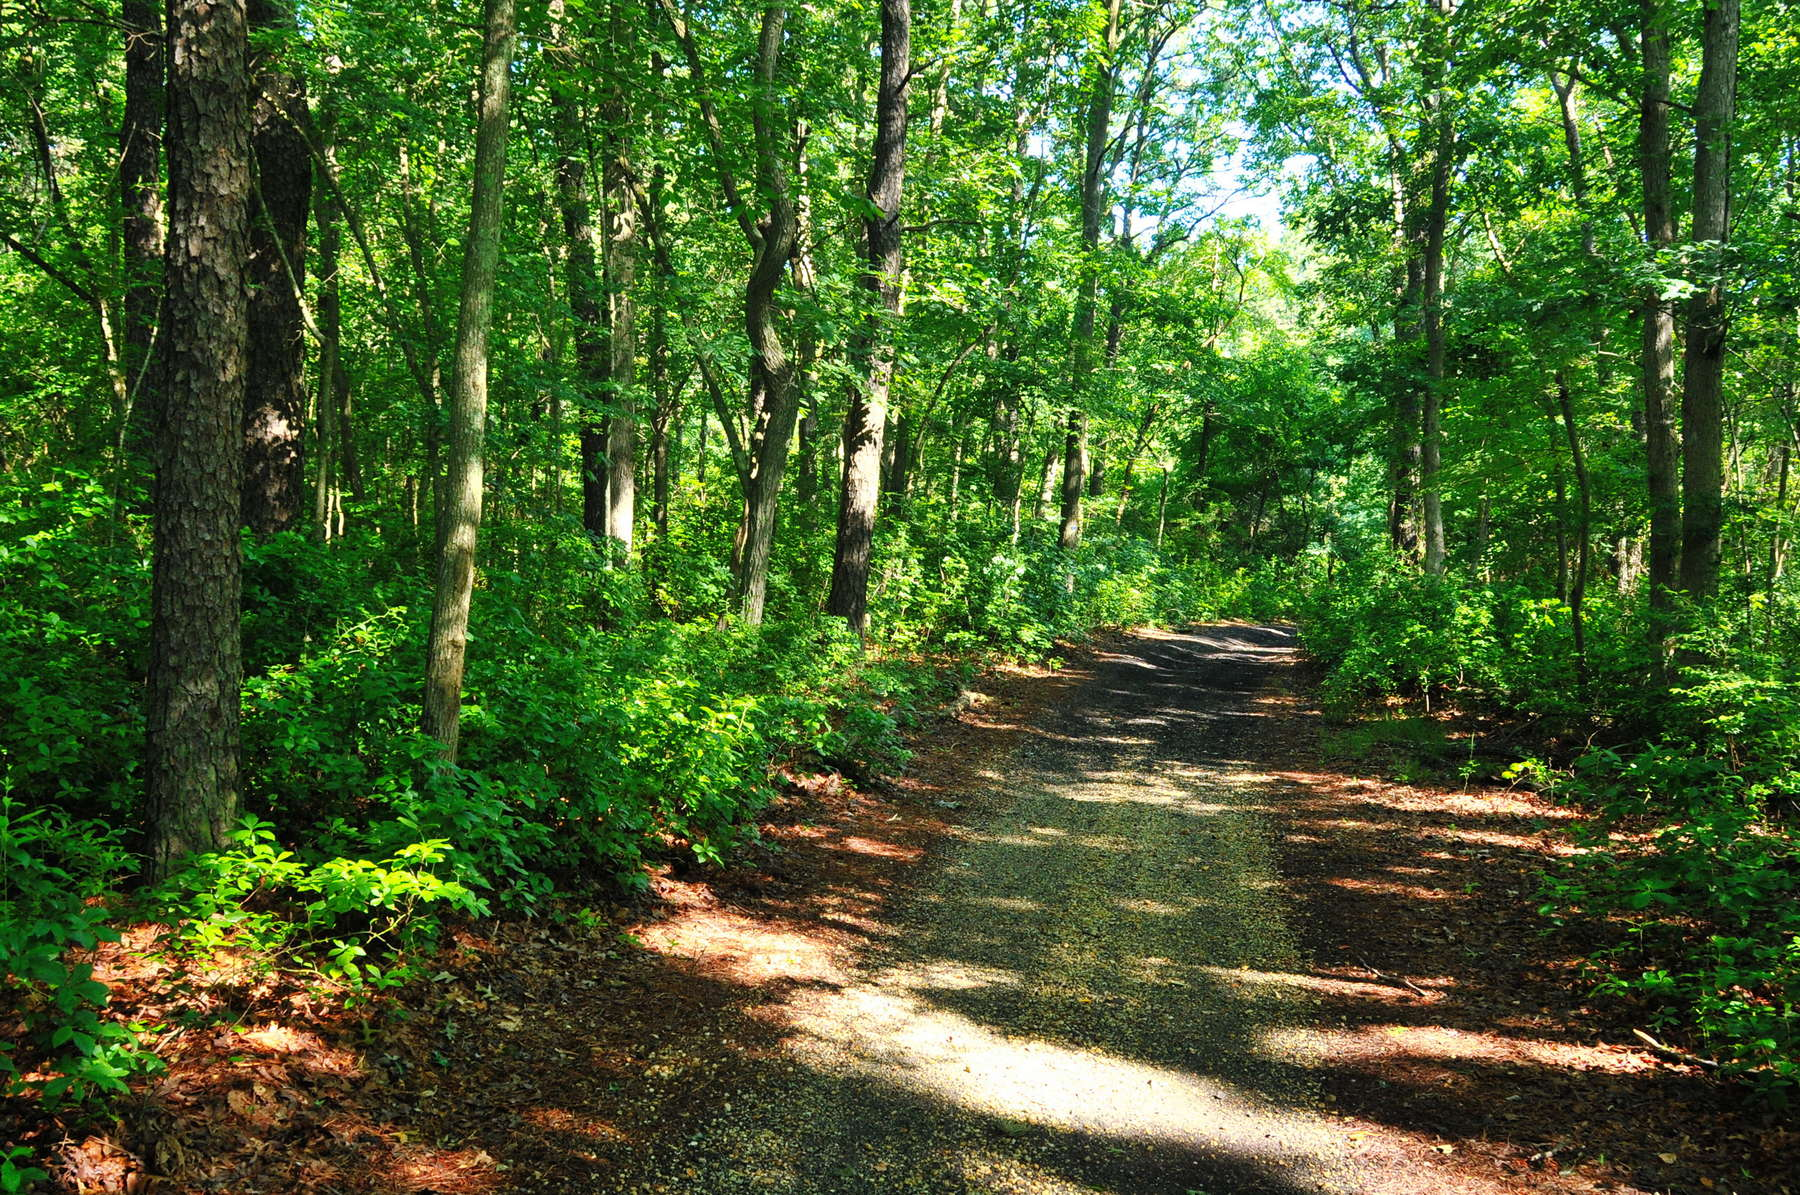 Bear Swamp Natural Area | 351- 399 Maxim Rd, Howell, NJ 07731 | Get ...